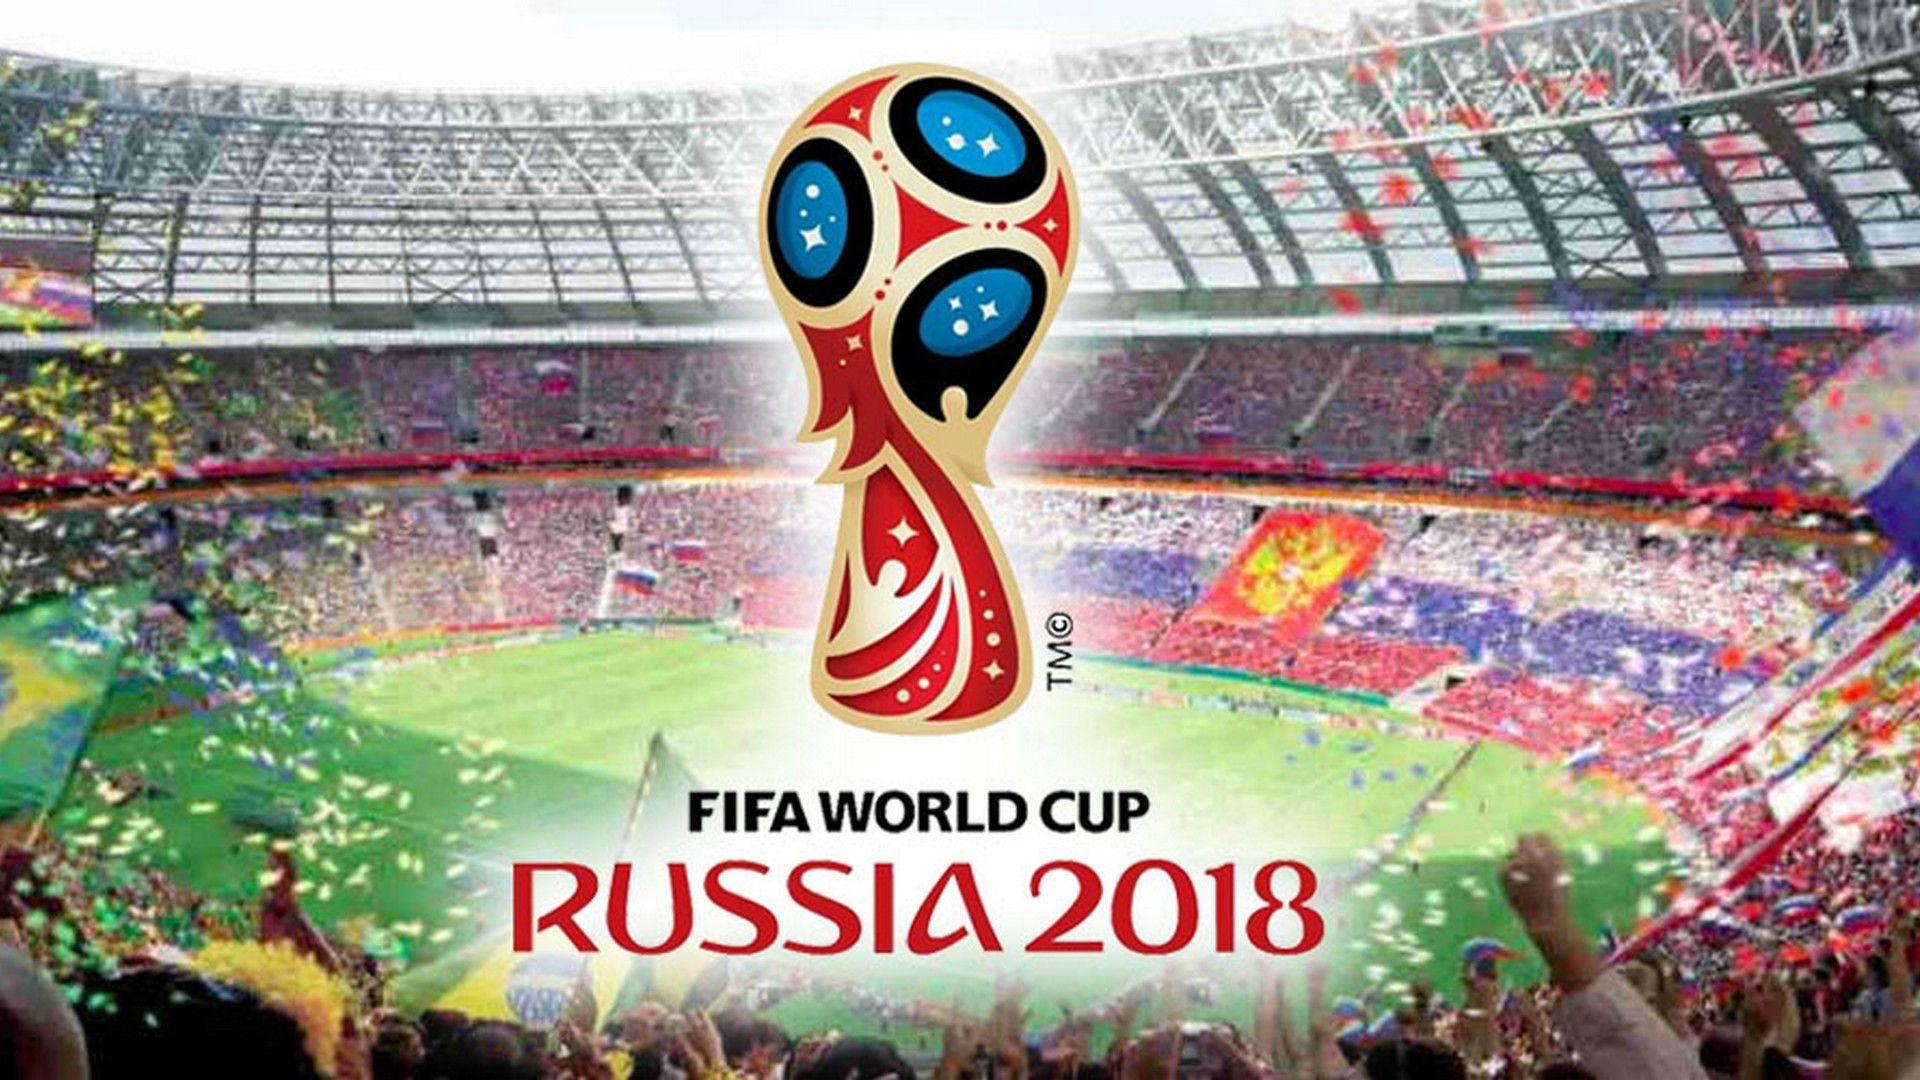 World Cup Russia Wallpaper Hd Best Wallpaper Hd World Cup  Groups Fifa World